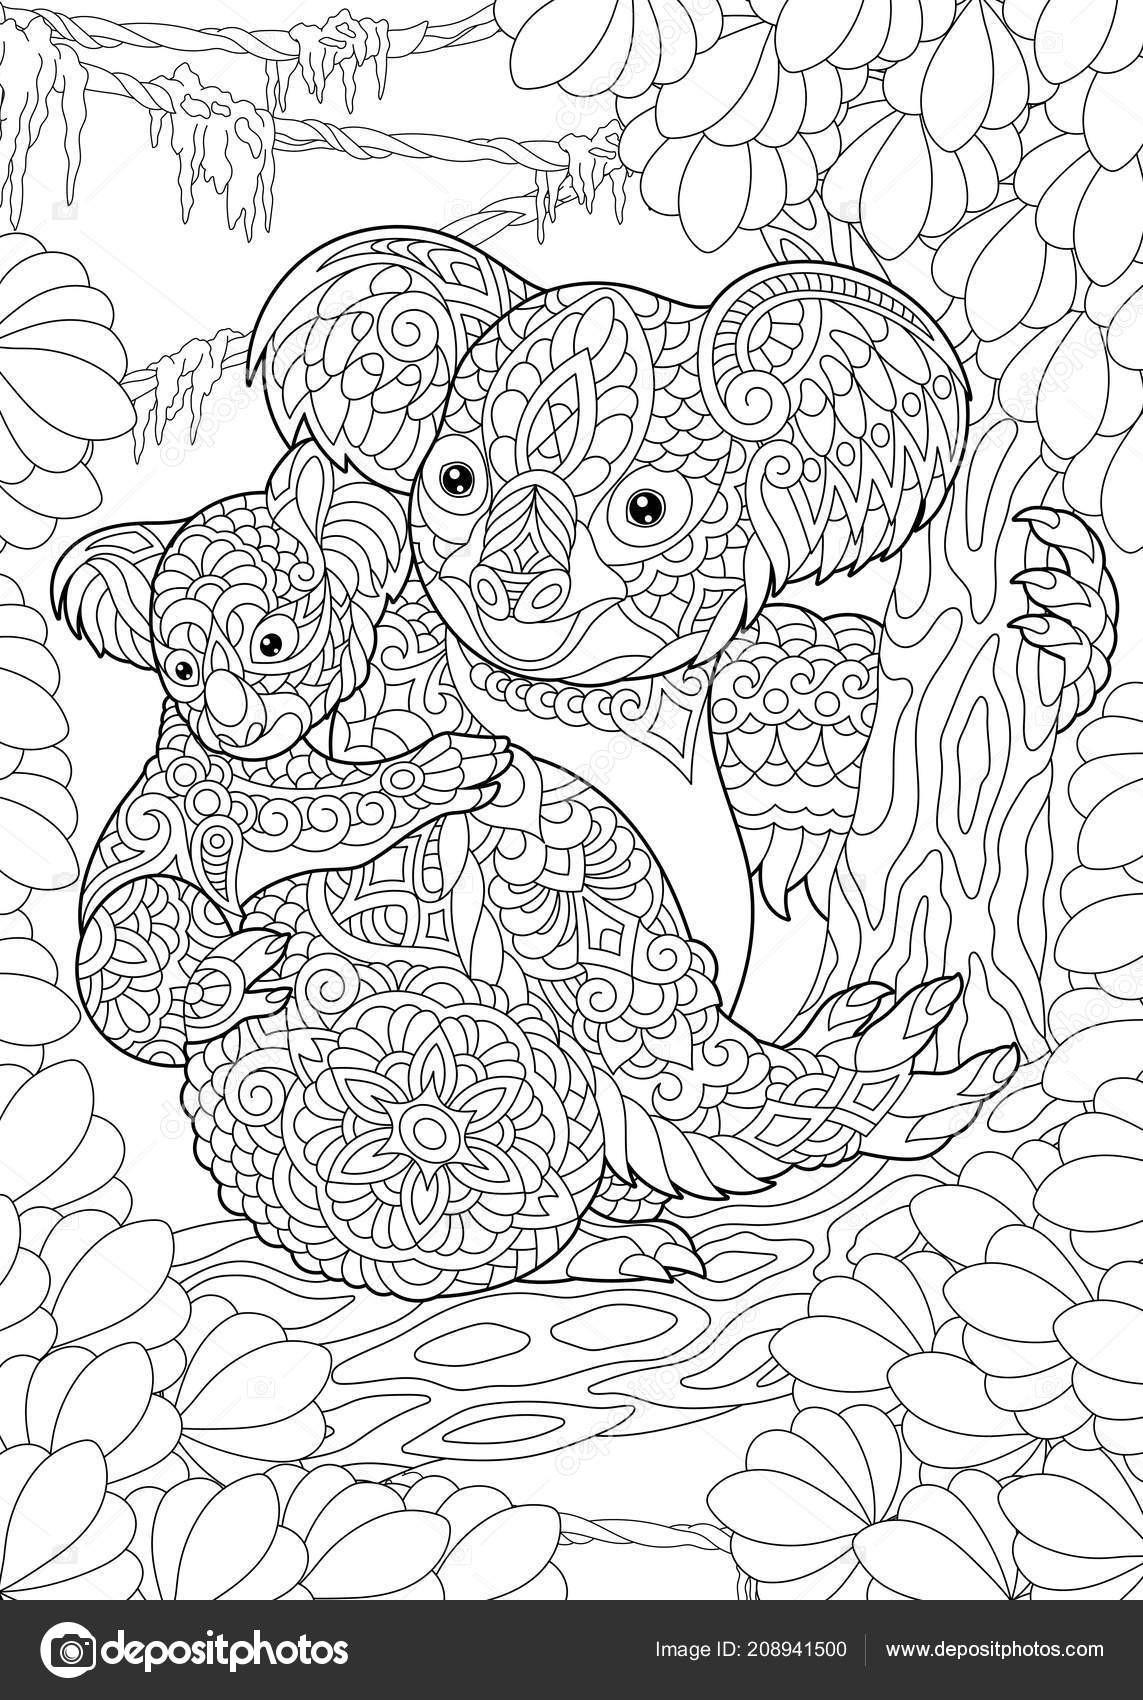 Ausmalbilder Natur Genial Kolorowania Kolorowanka Zabarwienia Obrazu Misie Koala Das Bild